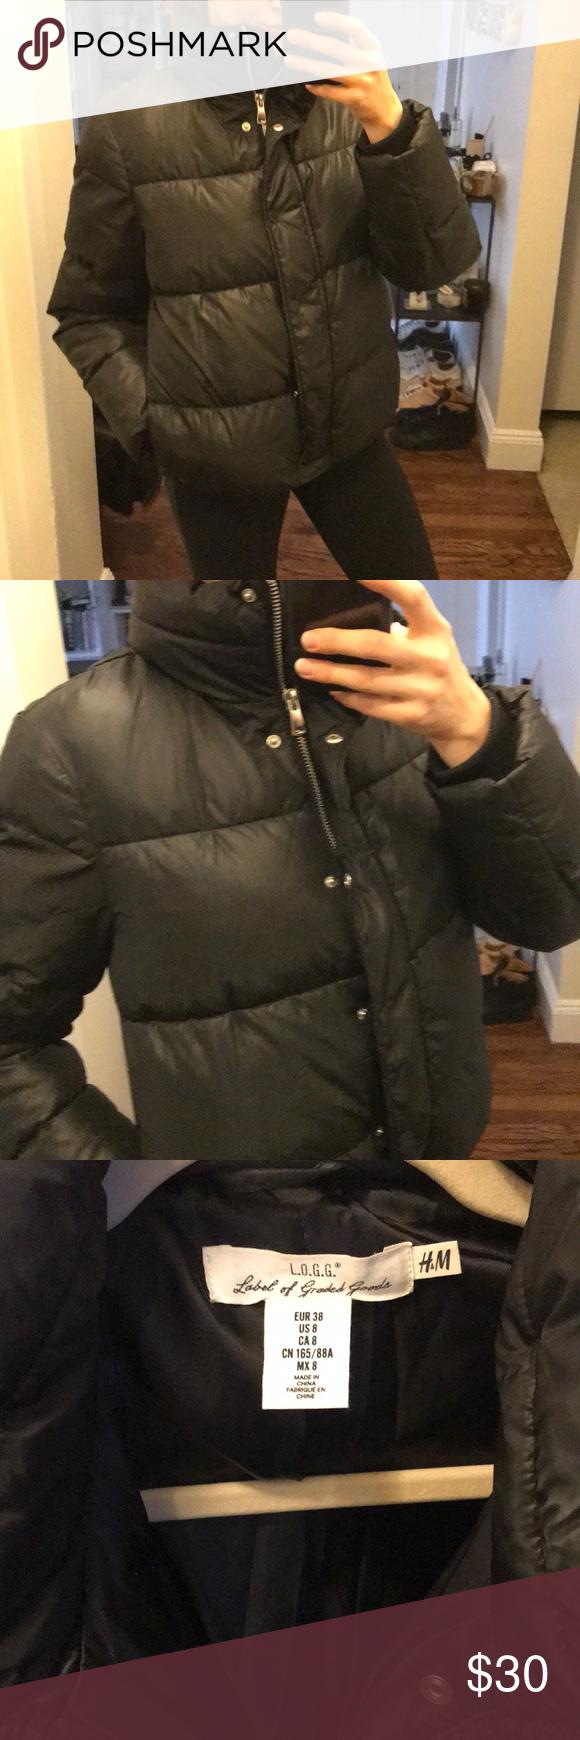 H&M puffer jacket Jackets, Puffer jackets, H&m jackets